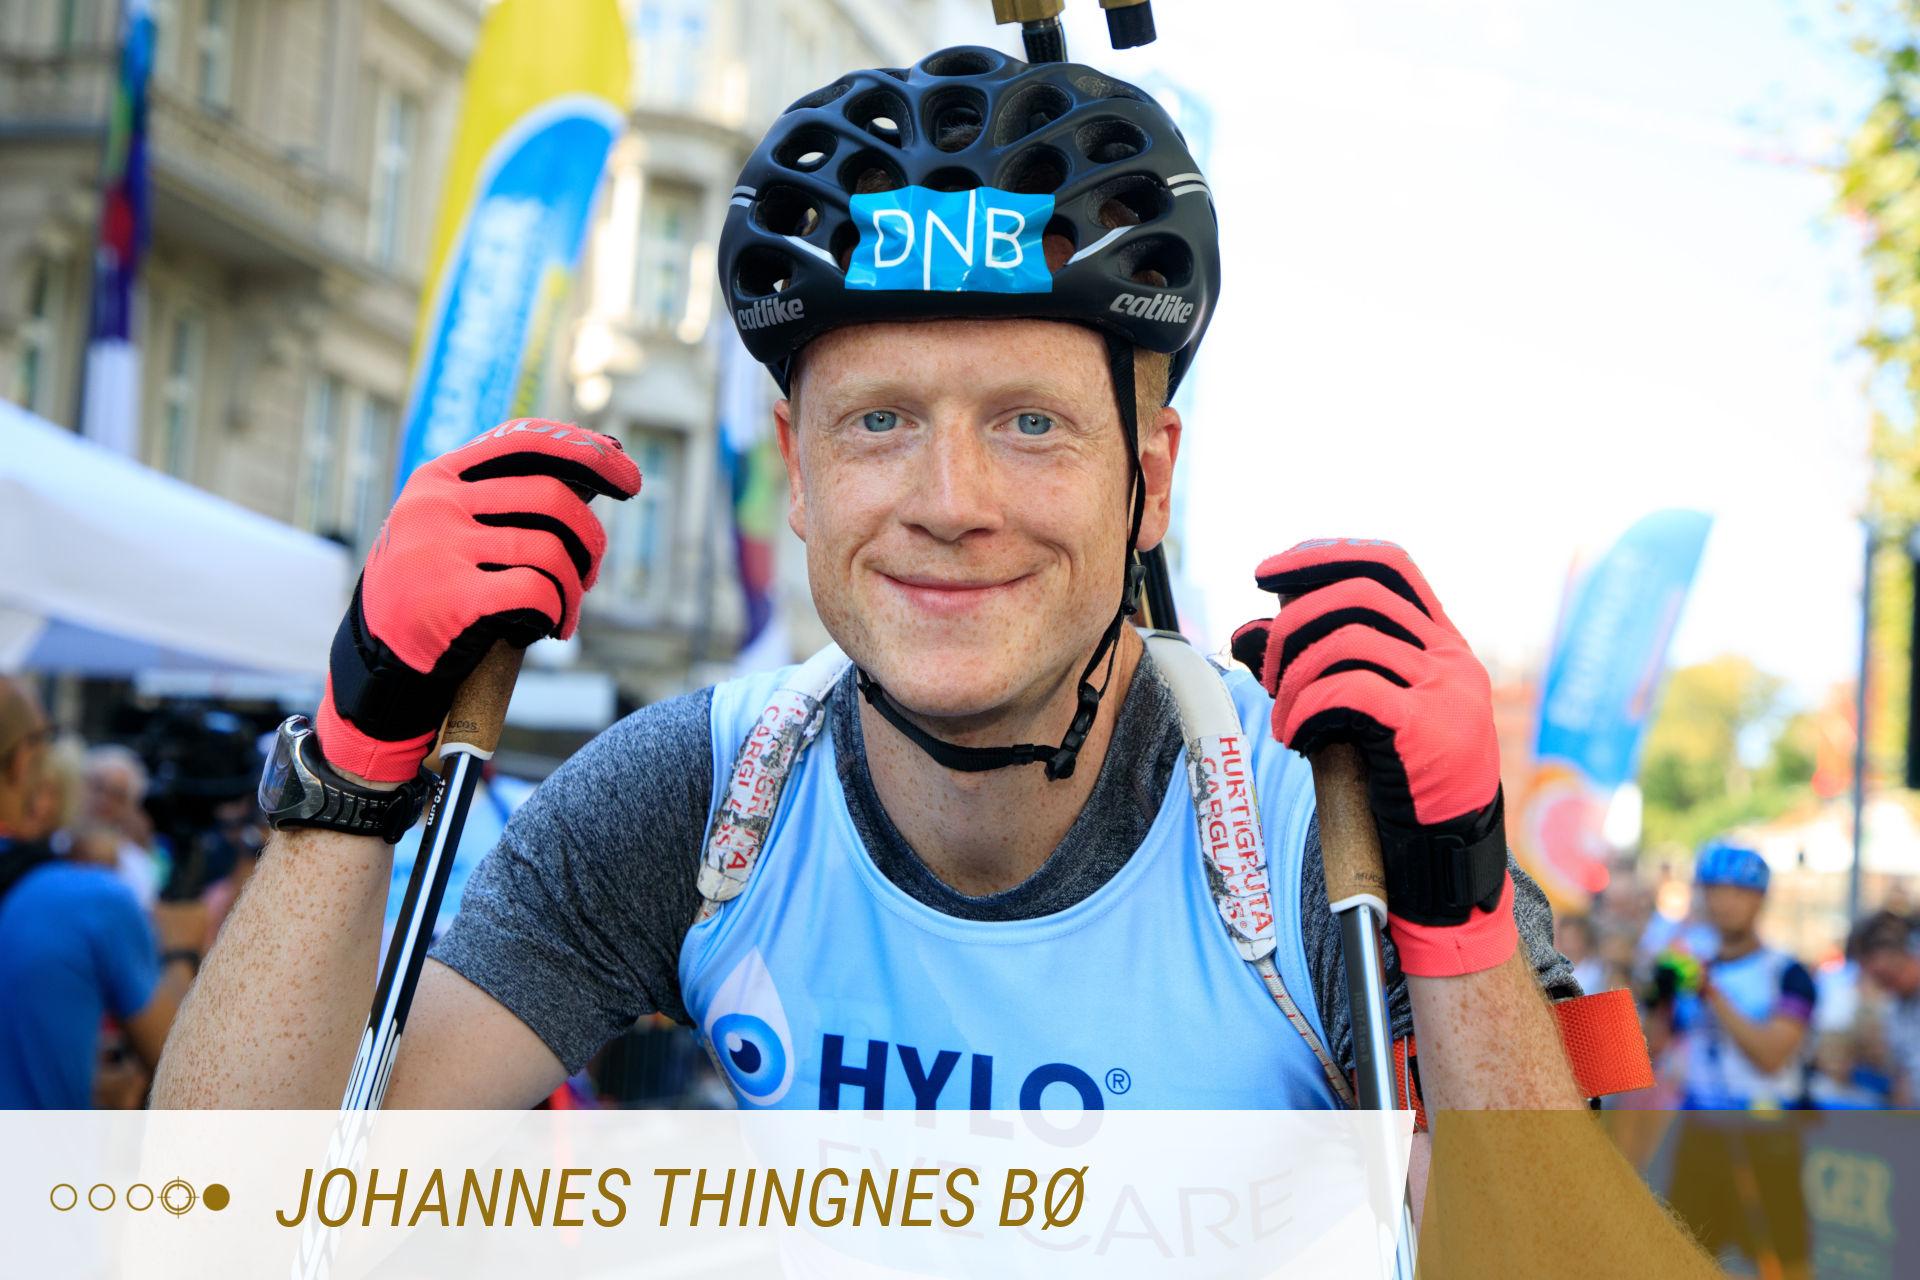 Athleten_JohannesThingnesBo